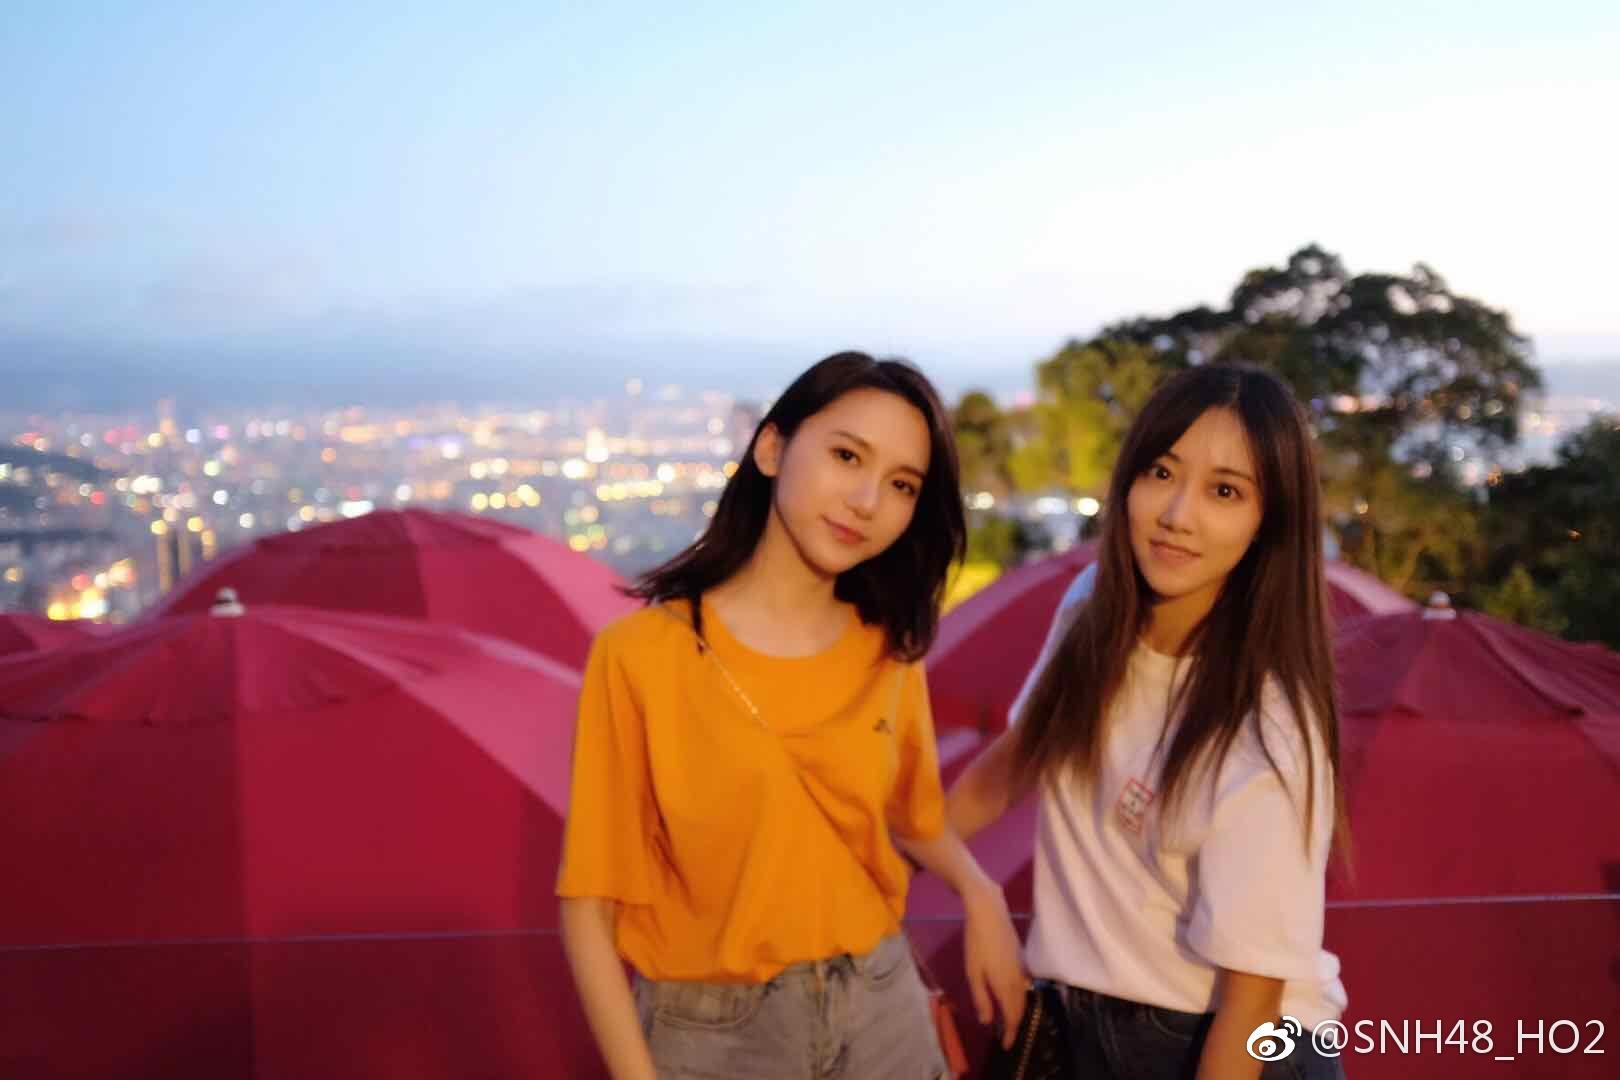 SNH48小组合HO2、BLUEV 即将迎出道首秀